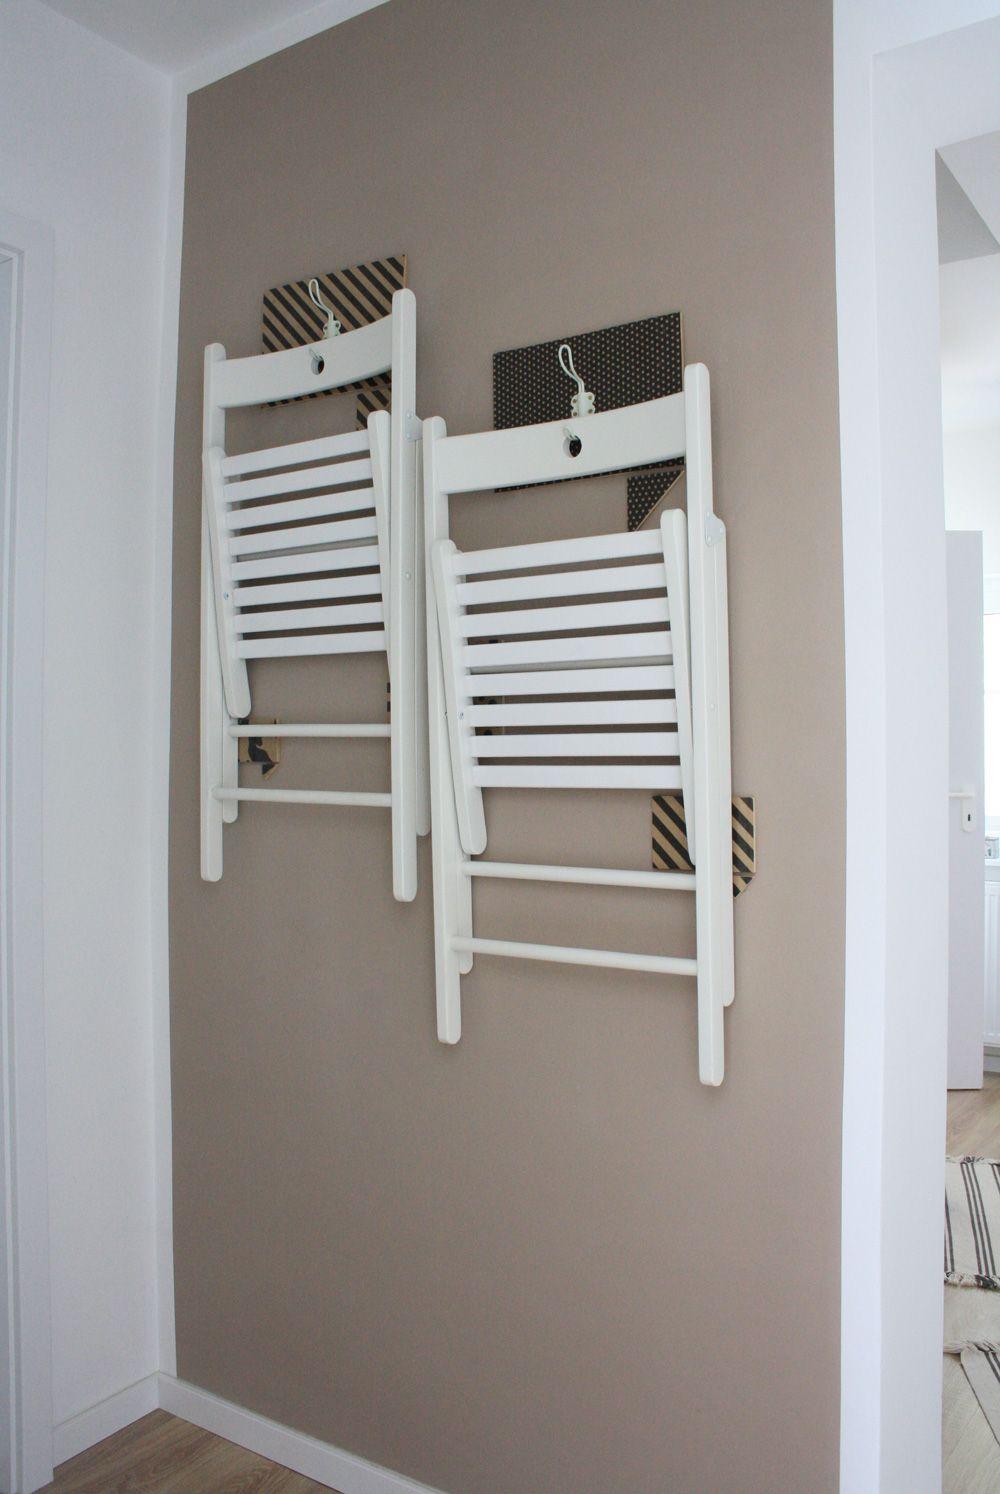 Ikea Klappstuhl Wand.Stühle Aufhängen Terje Klappstühle Hübsch Aufhängen